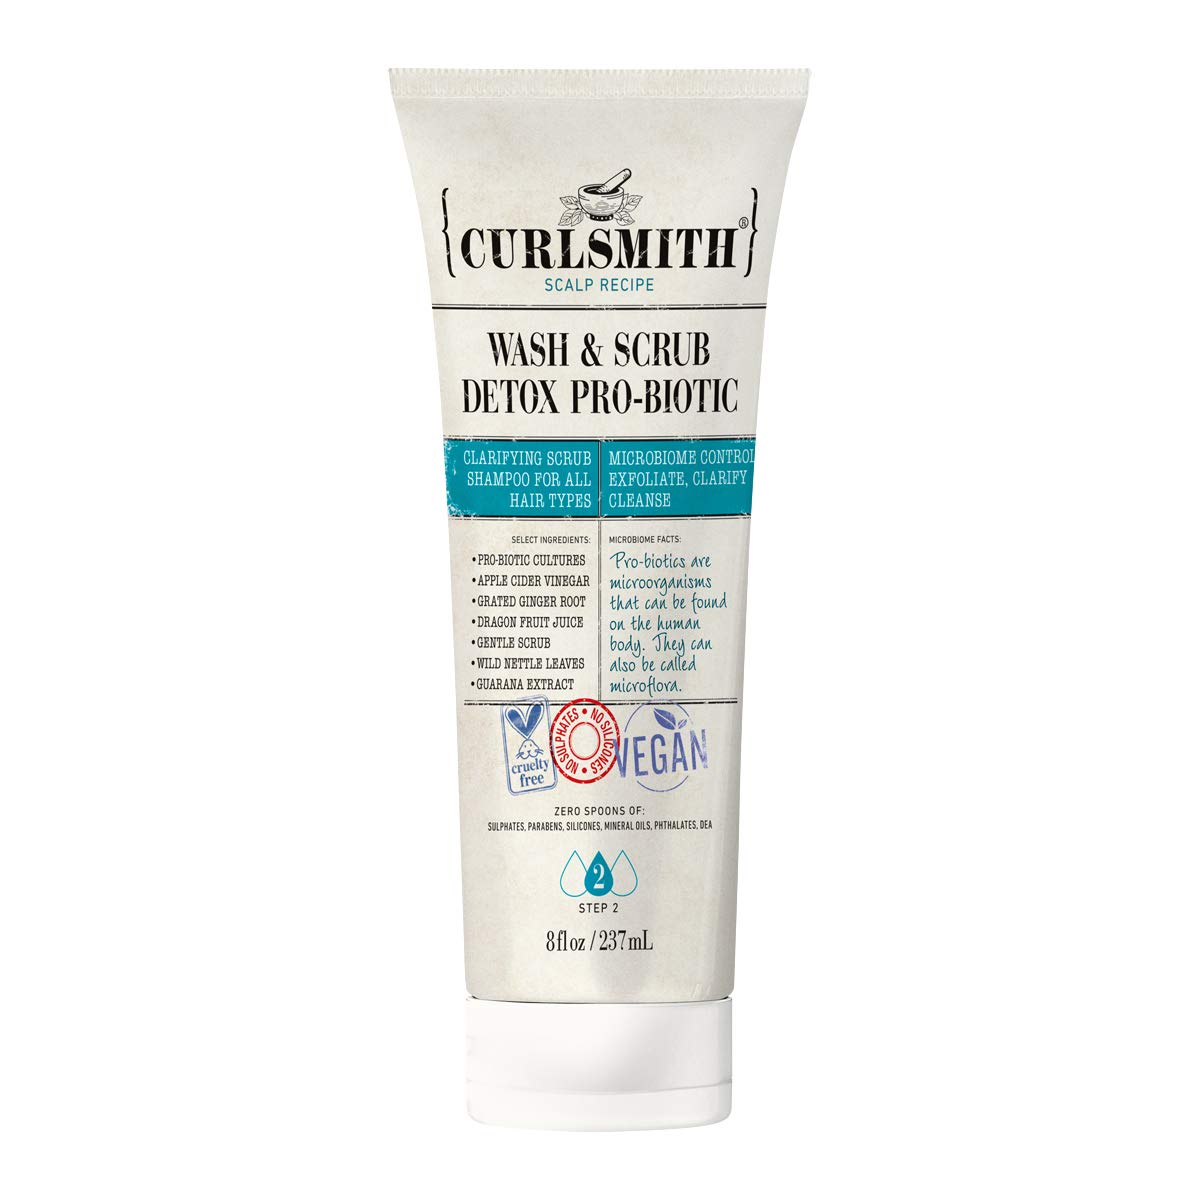 Curlsmith - Wash & Scrub Detox Pro-Biotic - Vegan Exfoliating Clarifying Shampoo for any Hair Type, Healthy Scalp (8oz)